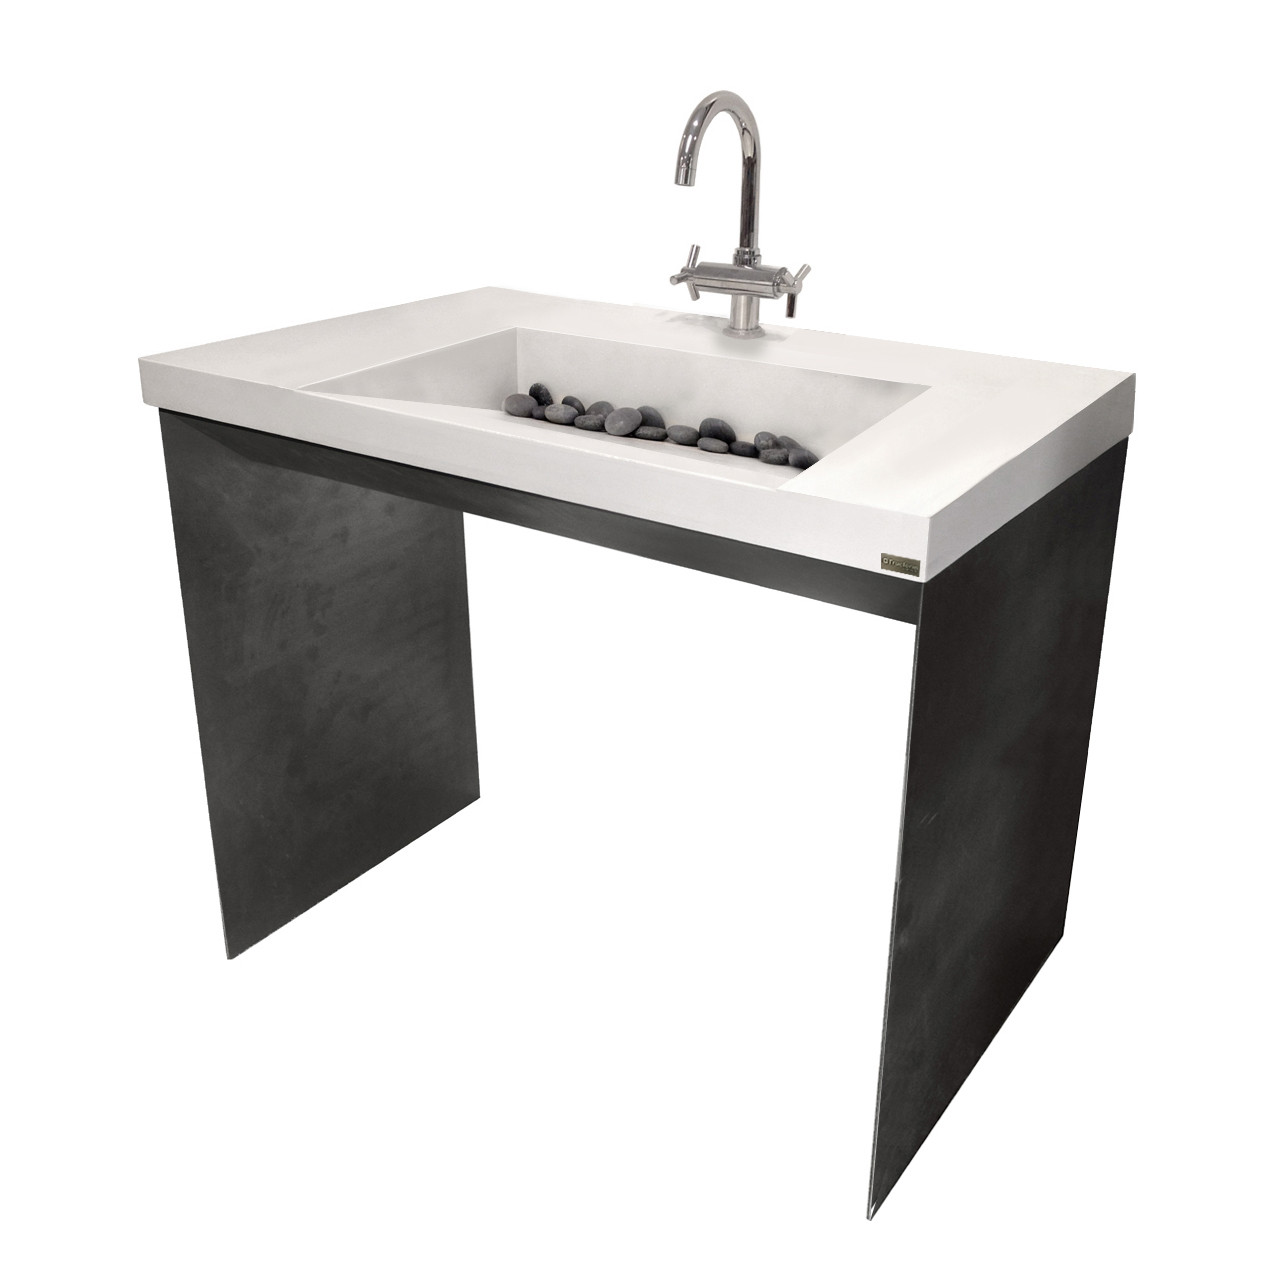 Trueform Contempo Concrete Bathroom Vanity Sink Is A Custom Modern